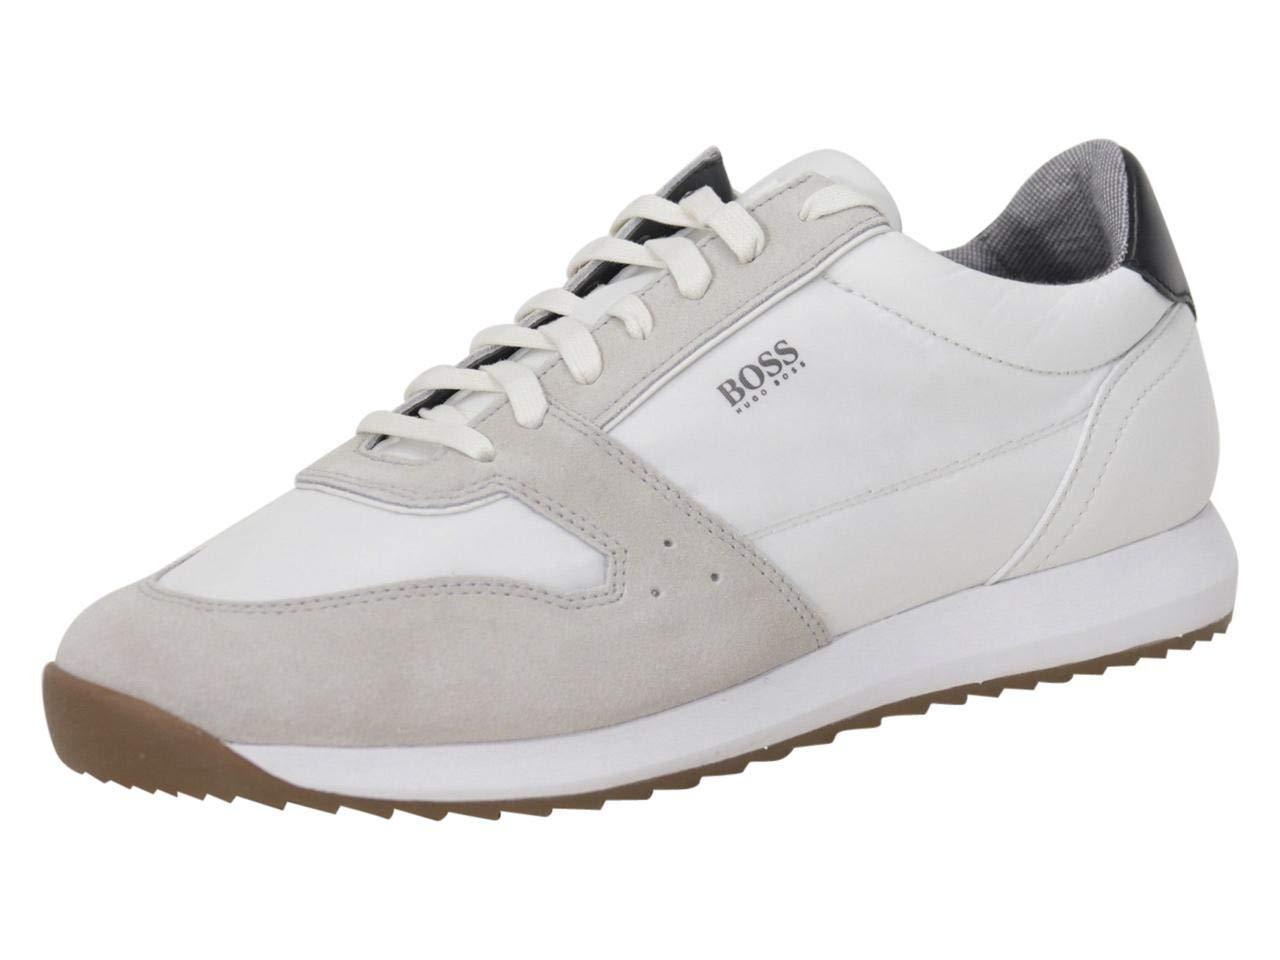 hugo boss sneakers sale Online shopping